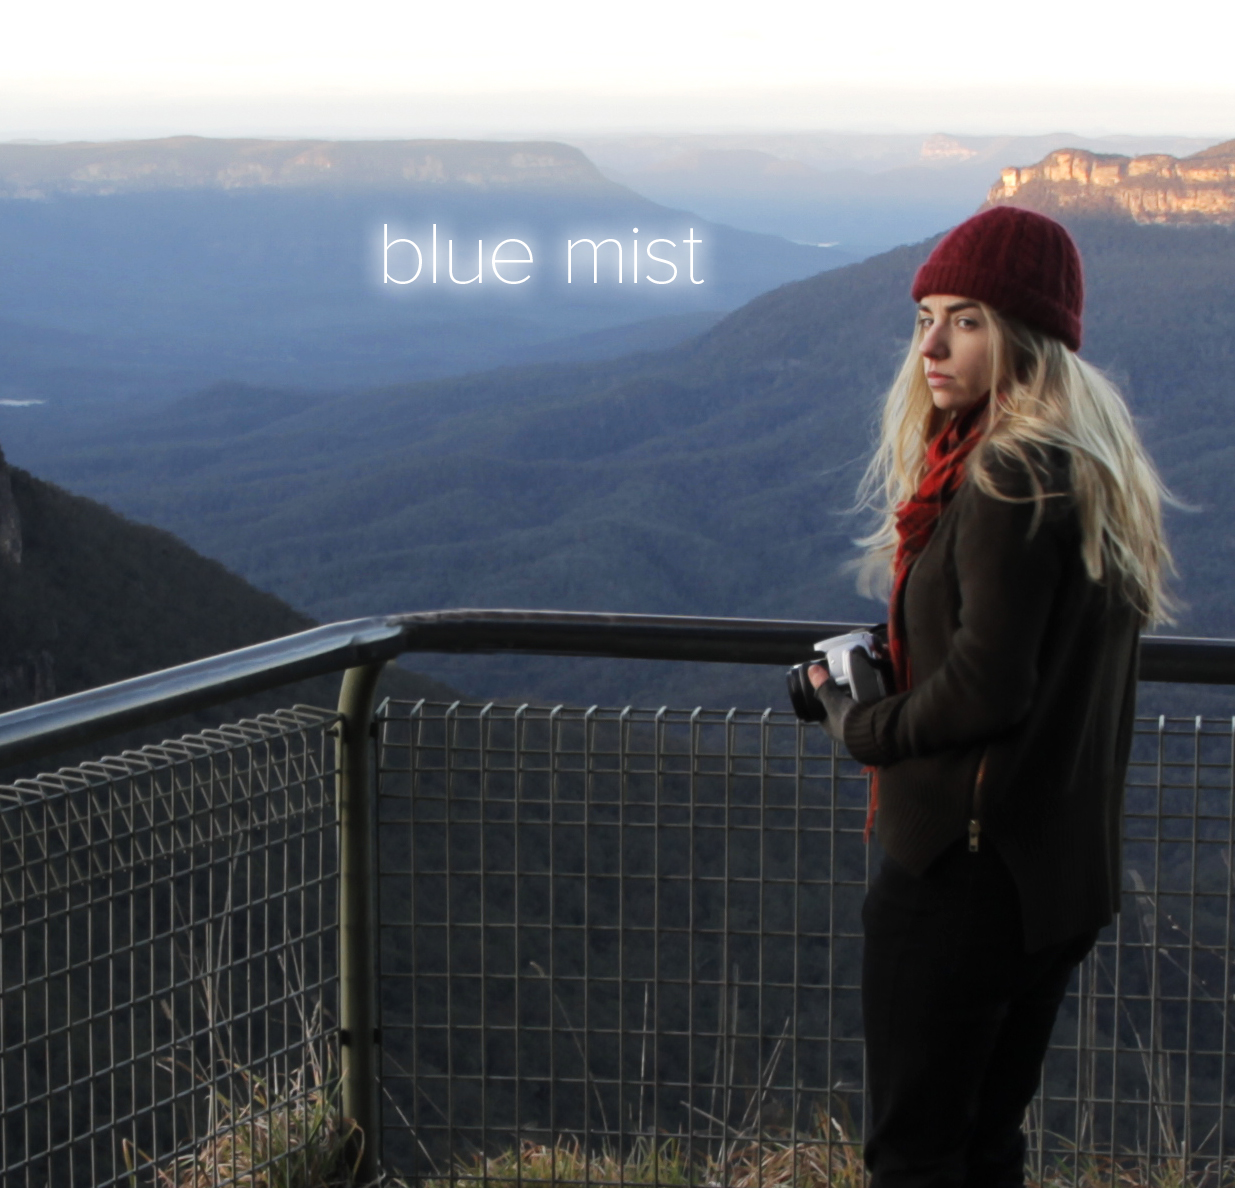 Blue Mist Poster Photo